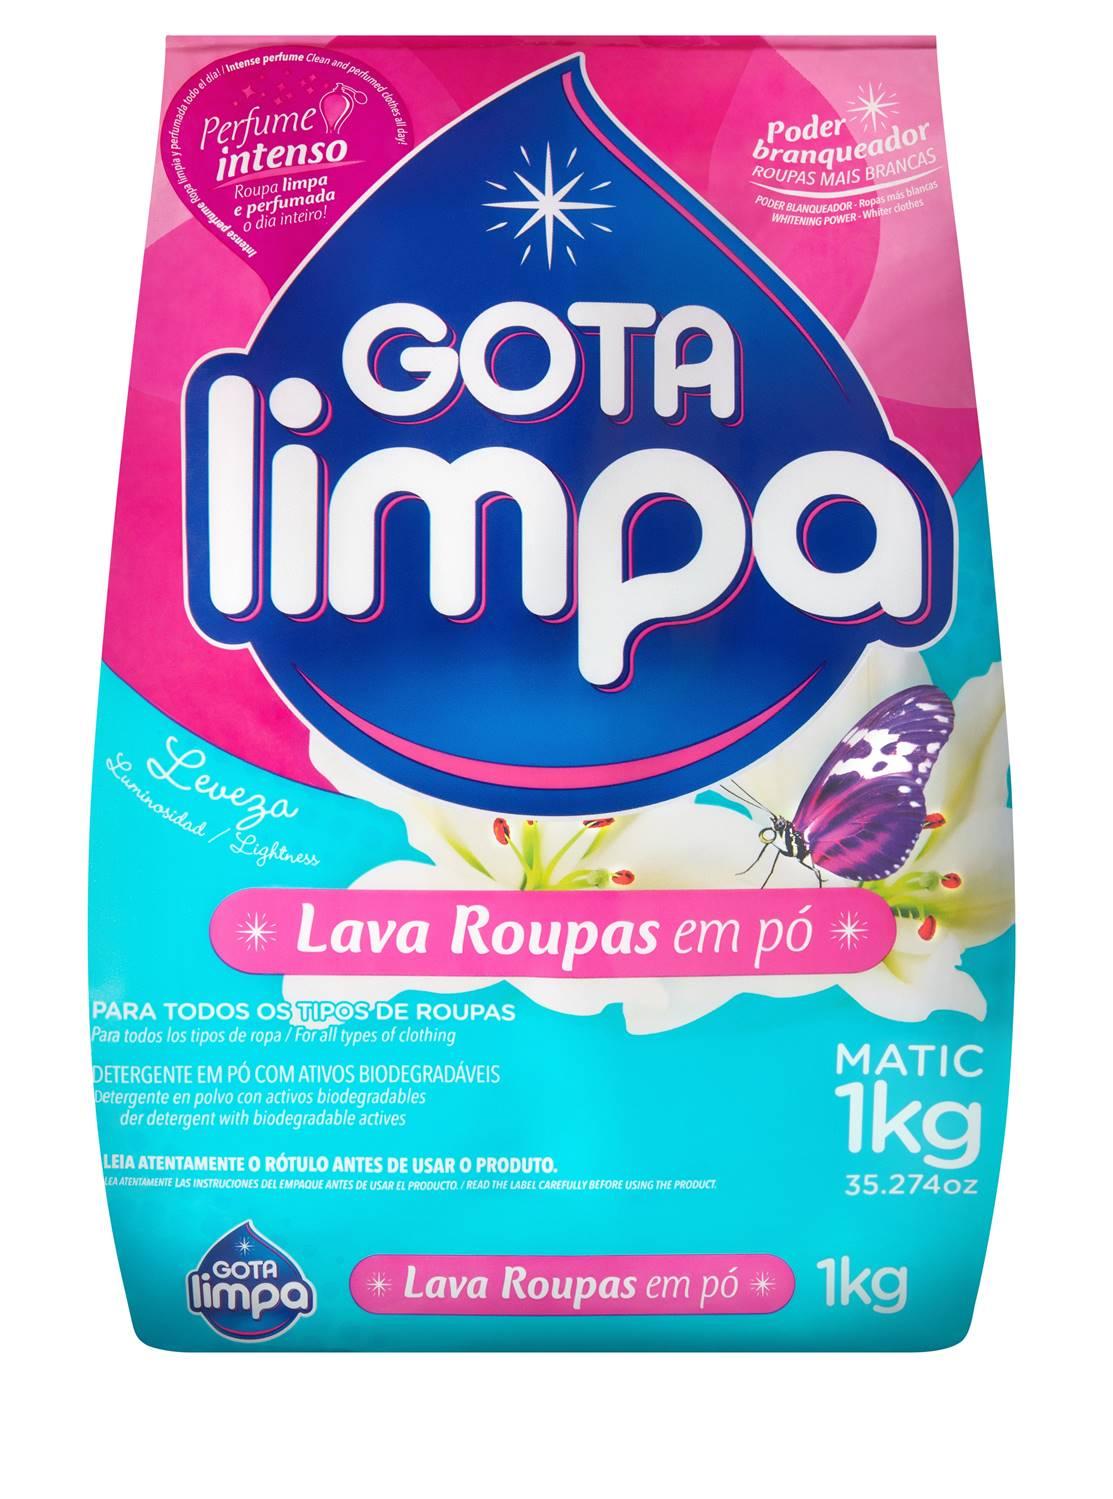 Gota Limpa Powder Laundry Detergent Lightness